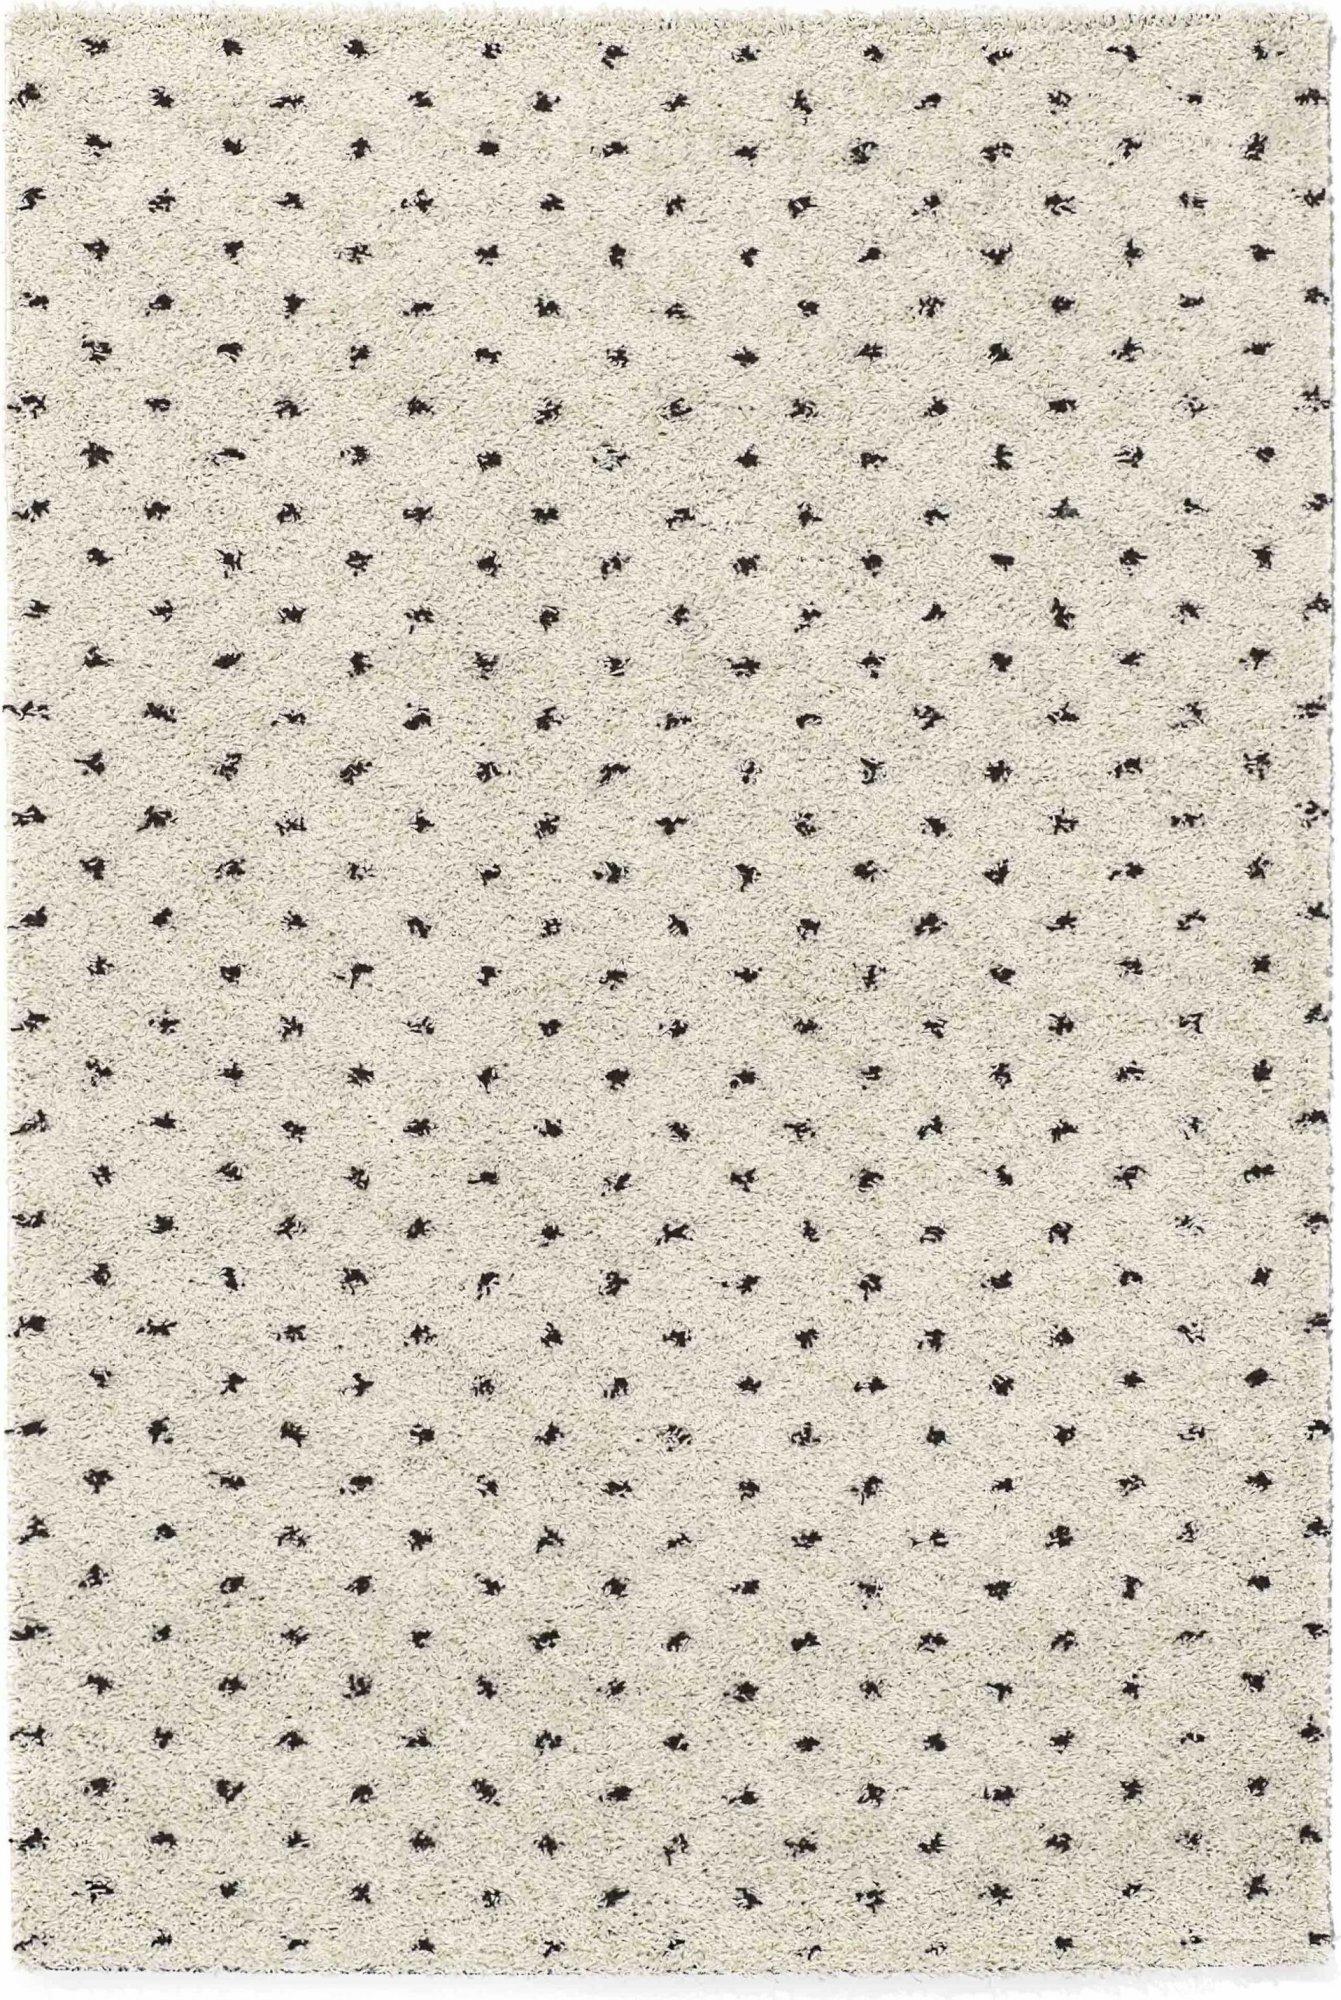 Tapis shaggy polypropylène beige 200x280